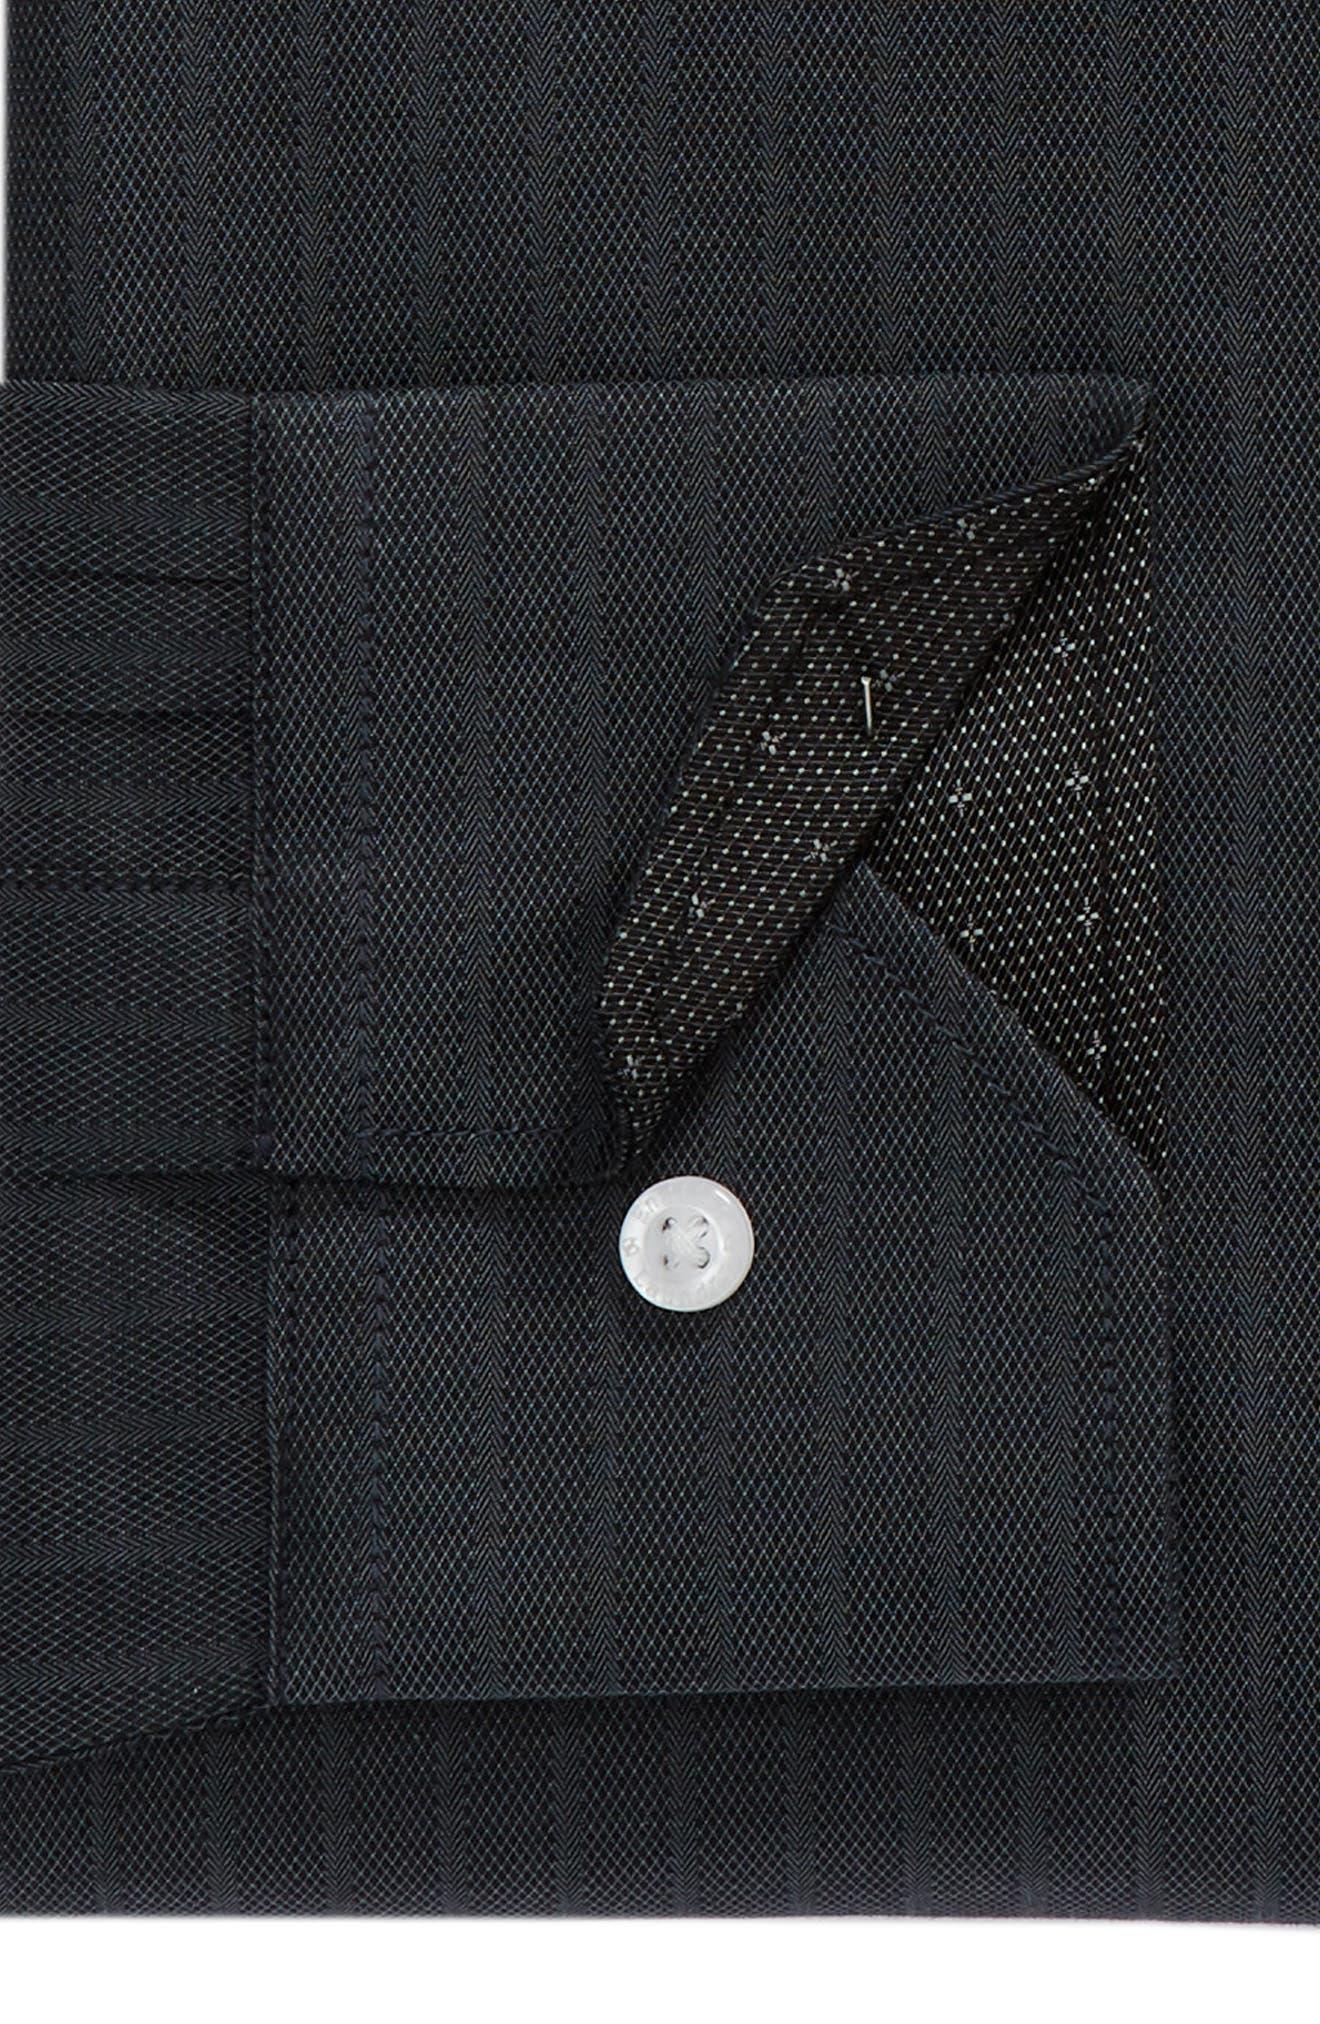 Regular Fit Solid Dress Shirt,                             Alternate thumbnail 6, color,                             GREY